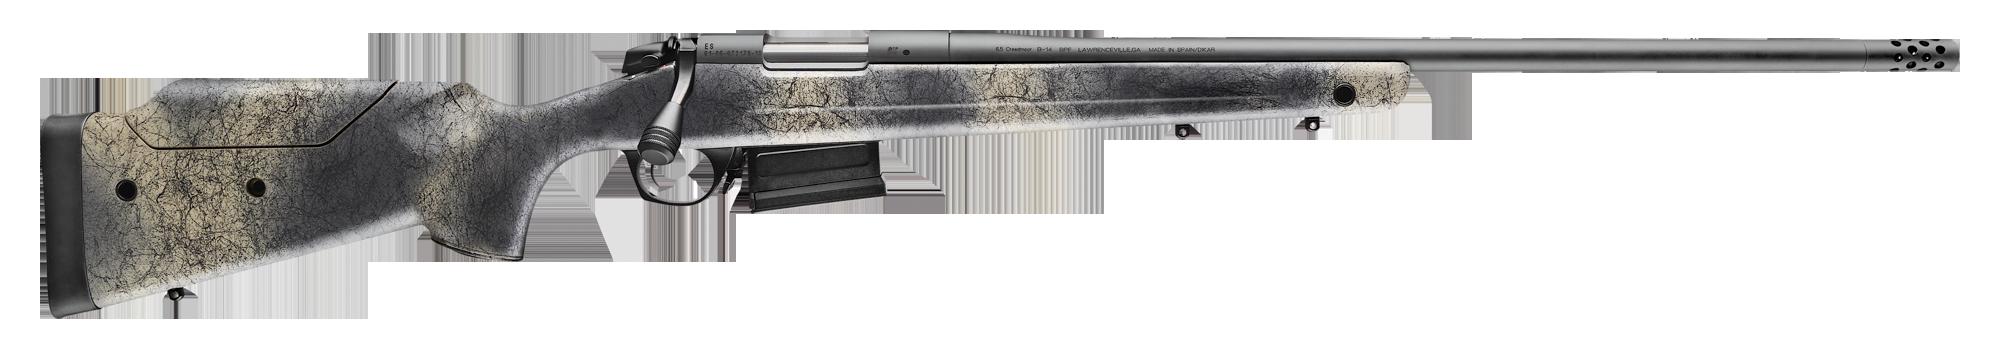 Bergara B-14 Terrain Wilderness Rifle